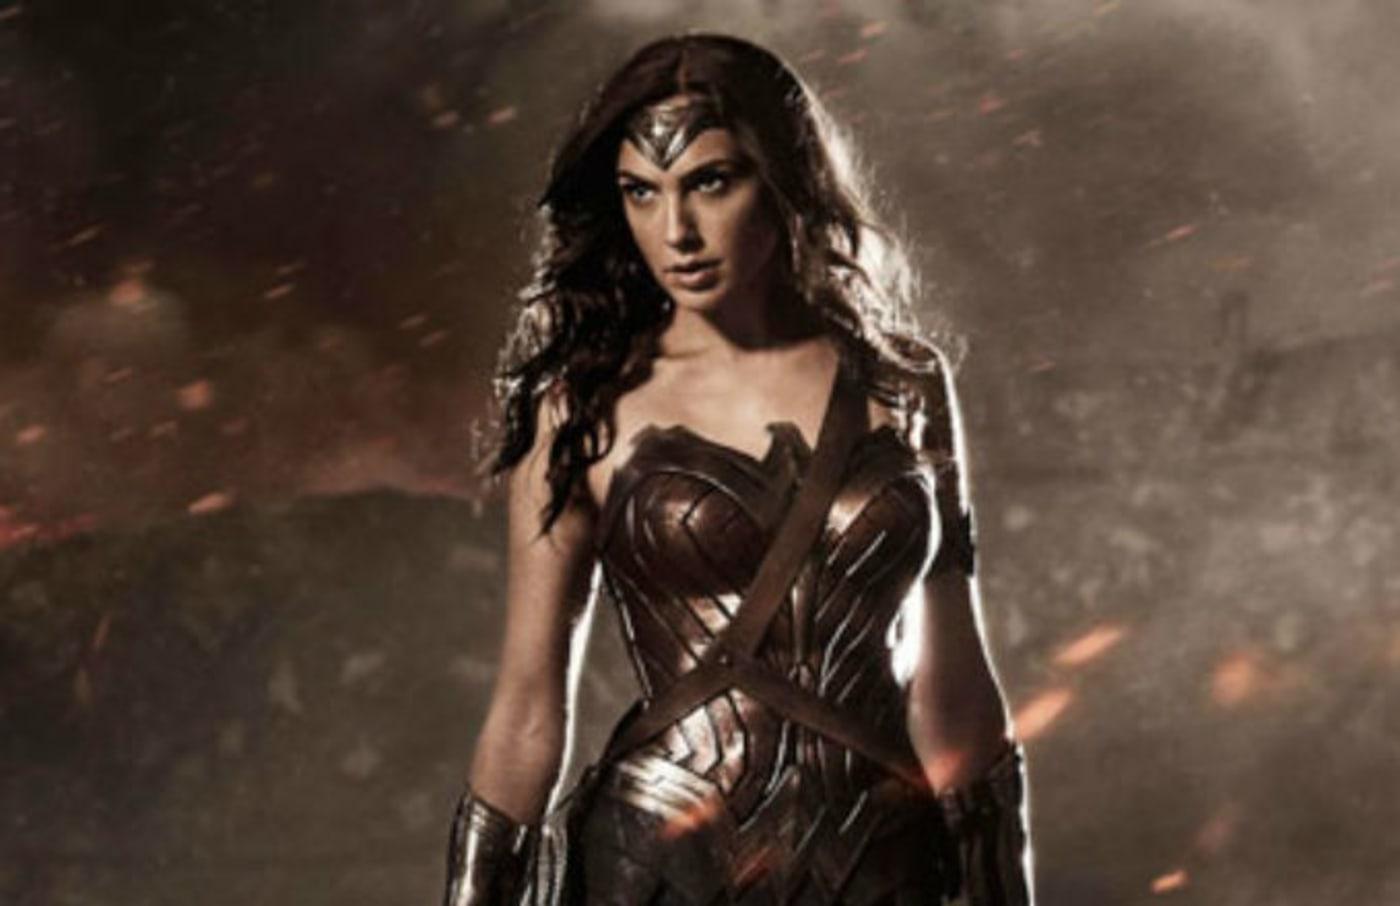 Director Michelle MacLaren Drops Out of 'Wonder Woman'